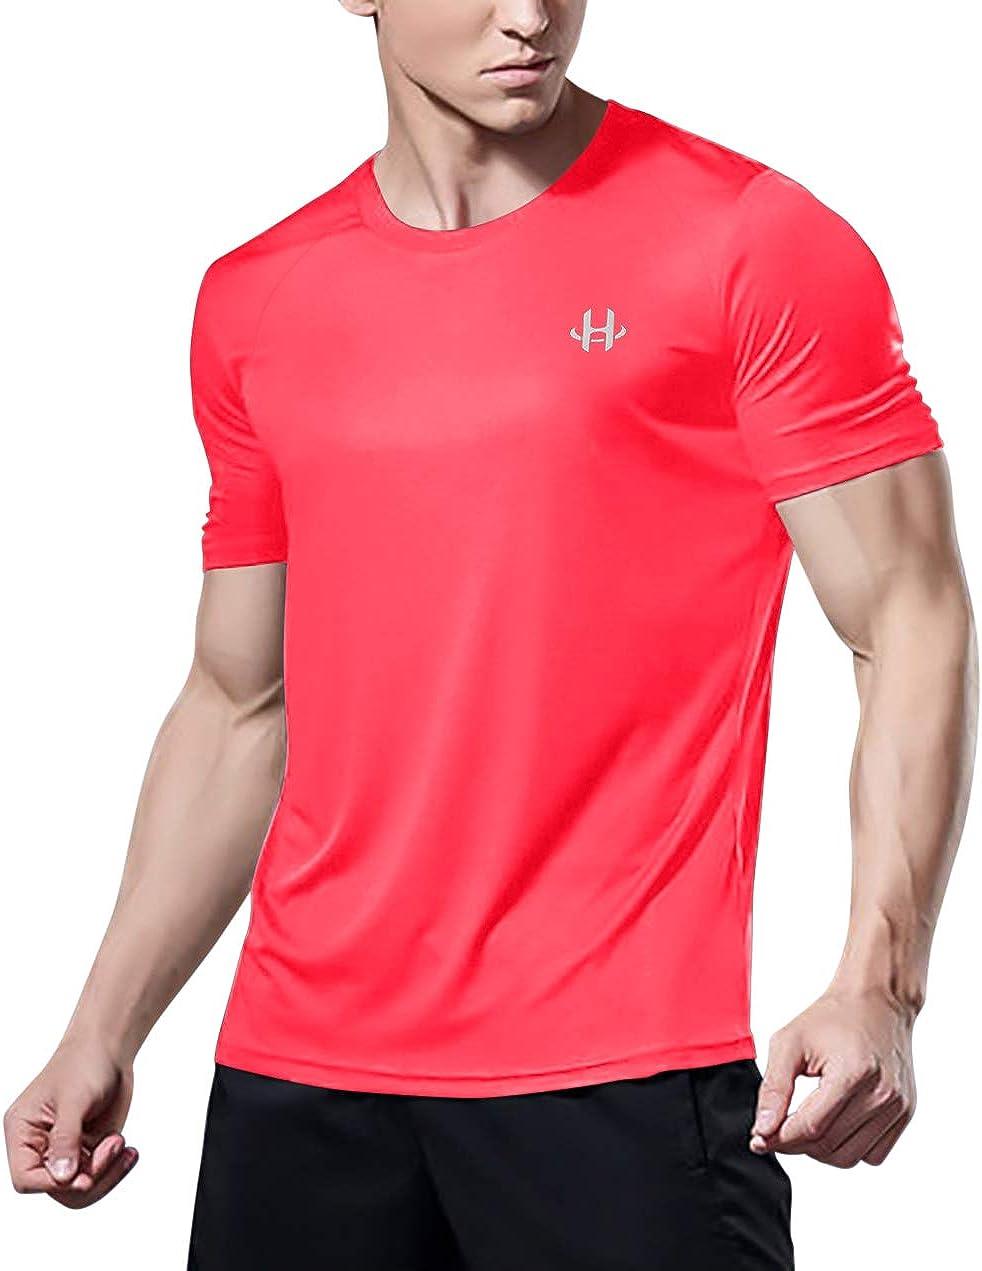 H Hellisal Surprise price Men's Quick Dry Short favorite Athletic T-Shirt Sleeve Gym Act